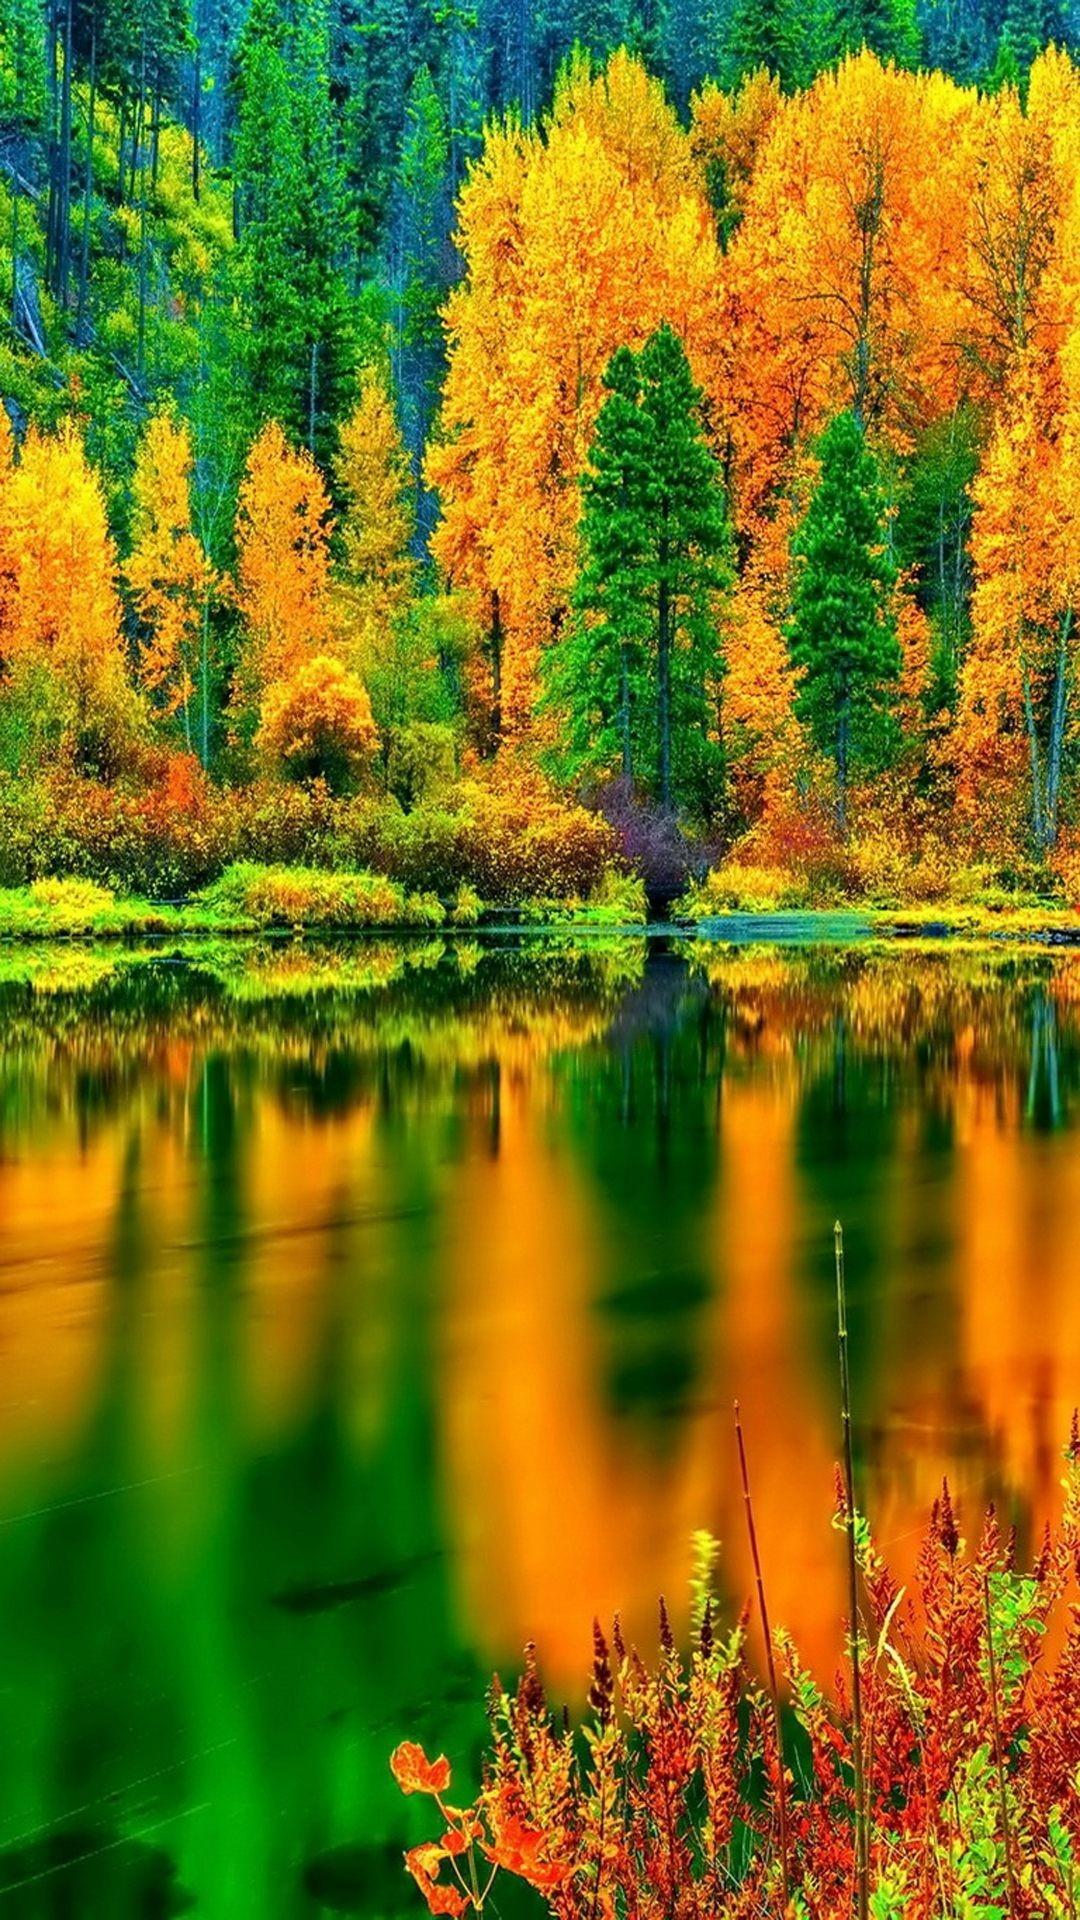 Nature/Landscape Autumn Lake iPhone 6 Plus Wallpapers – autumn lake, hd iPhone  6 Plus Wallpapers – autumn: You should have these iPhone 6 Plus wallpaper  …